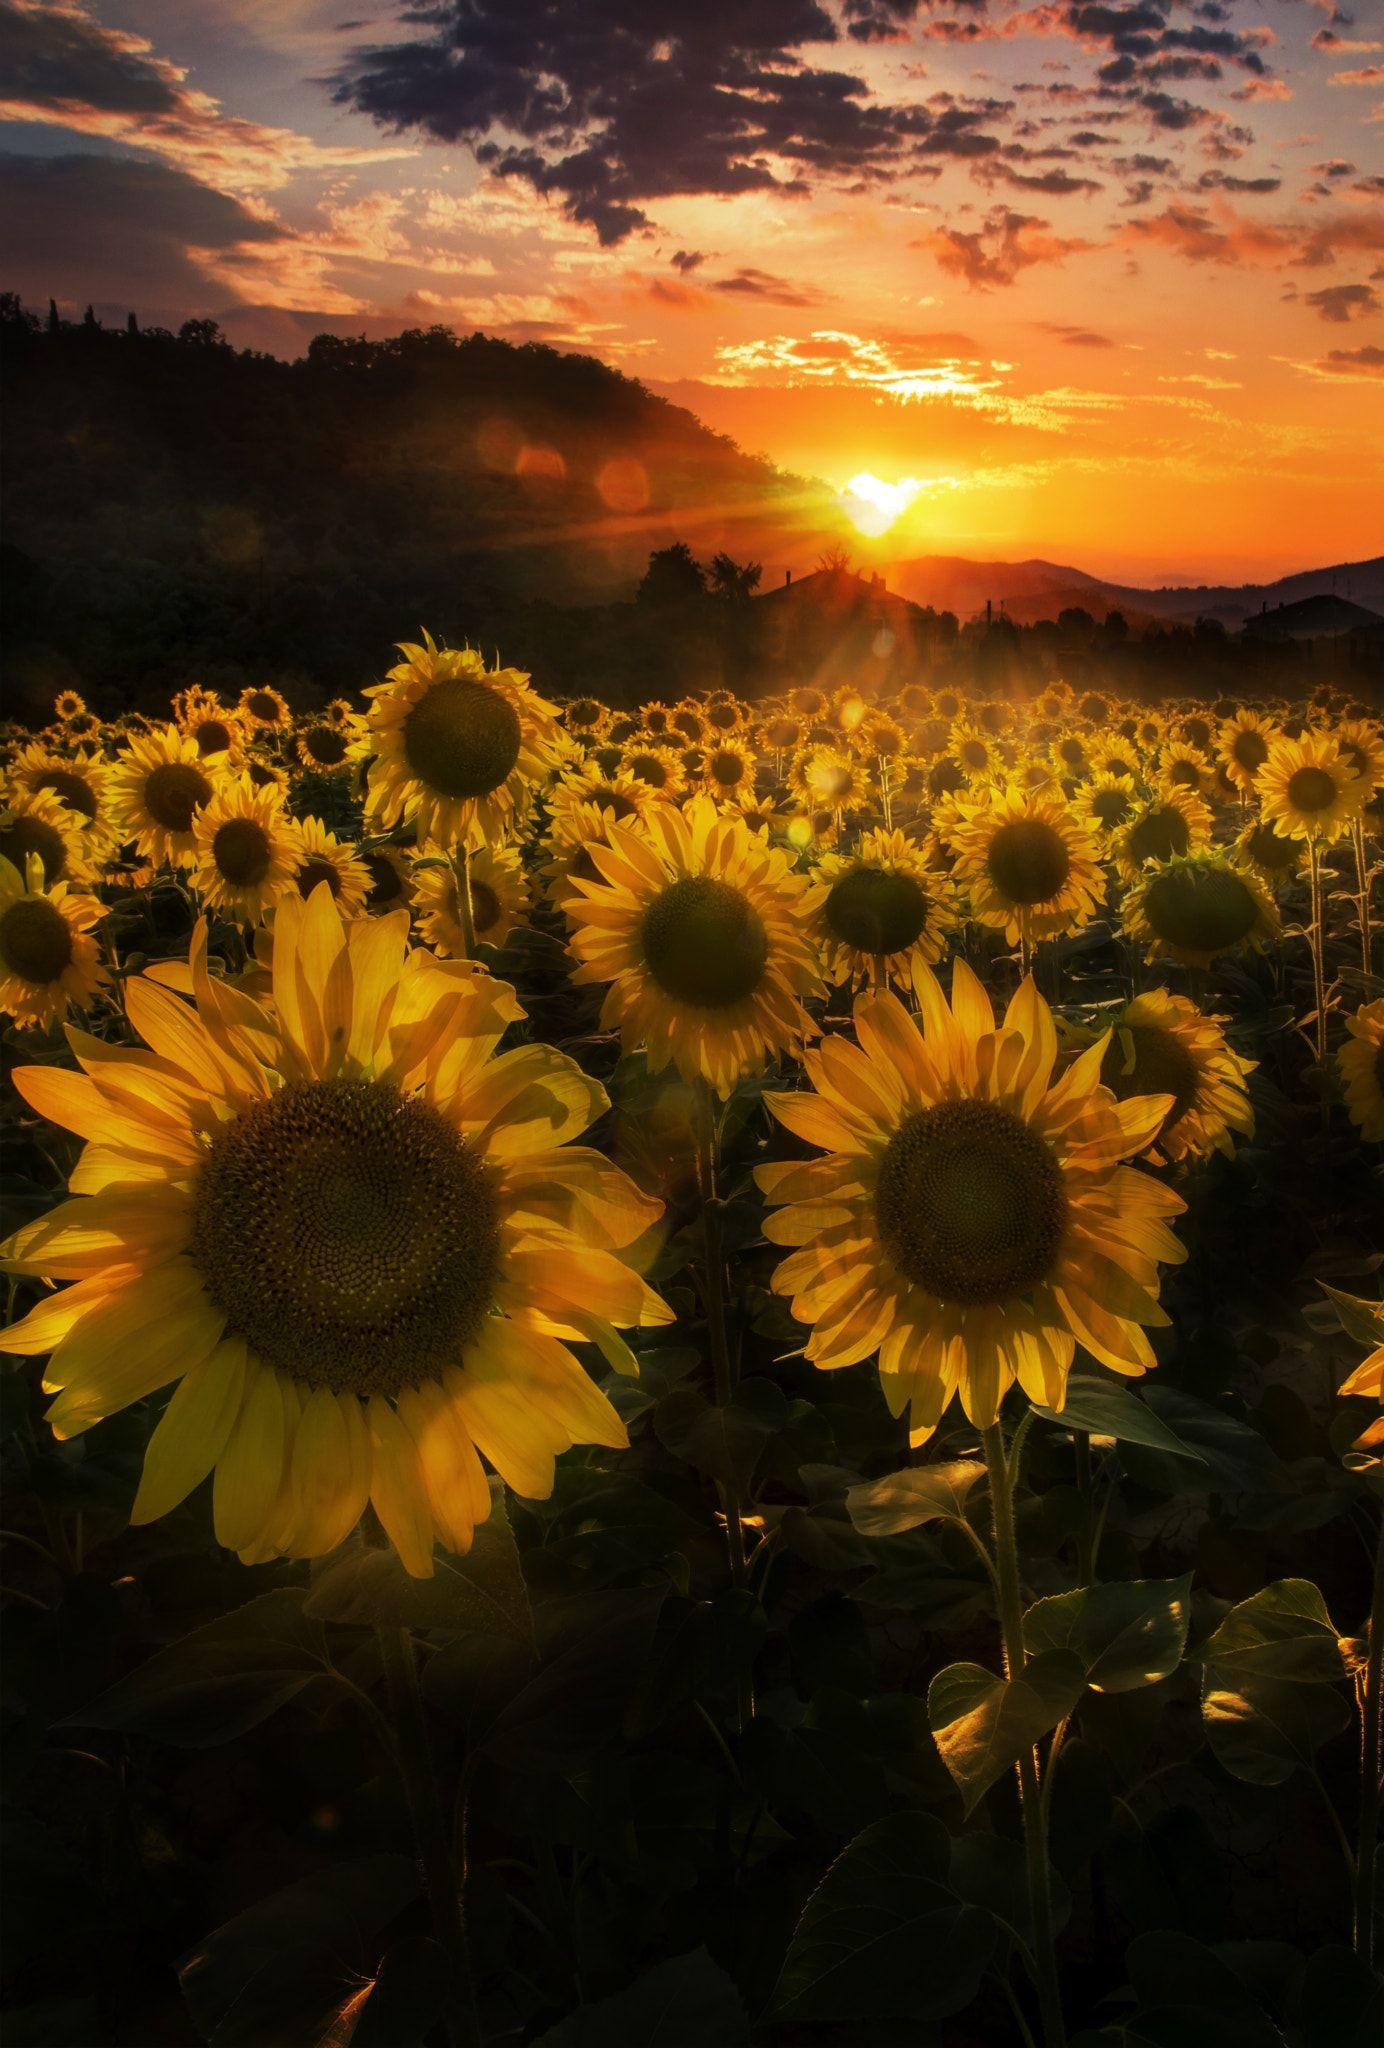 Sunset among sunflowers - null | Sunflowers | Pinterest | Sunflowers ...